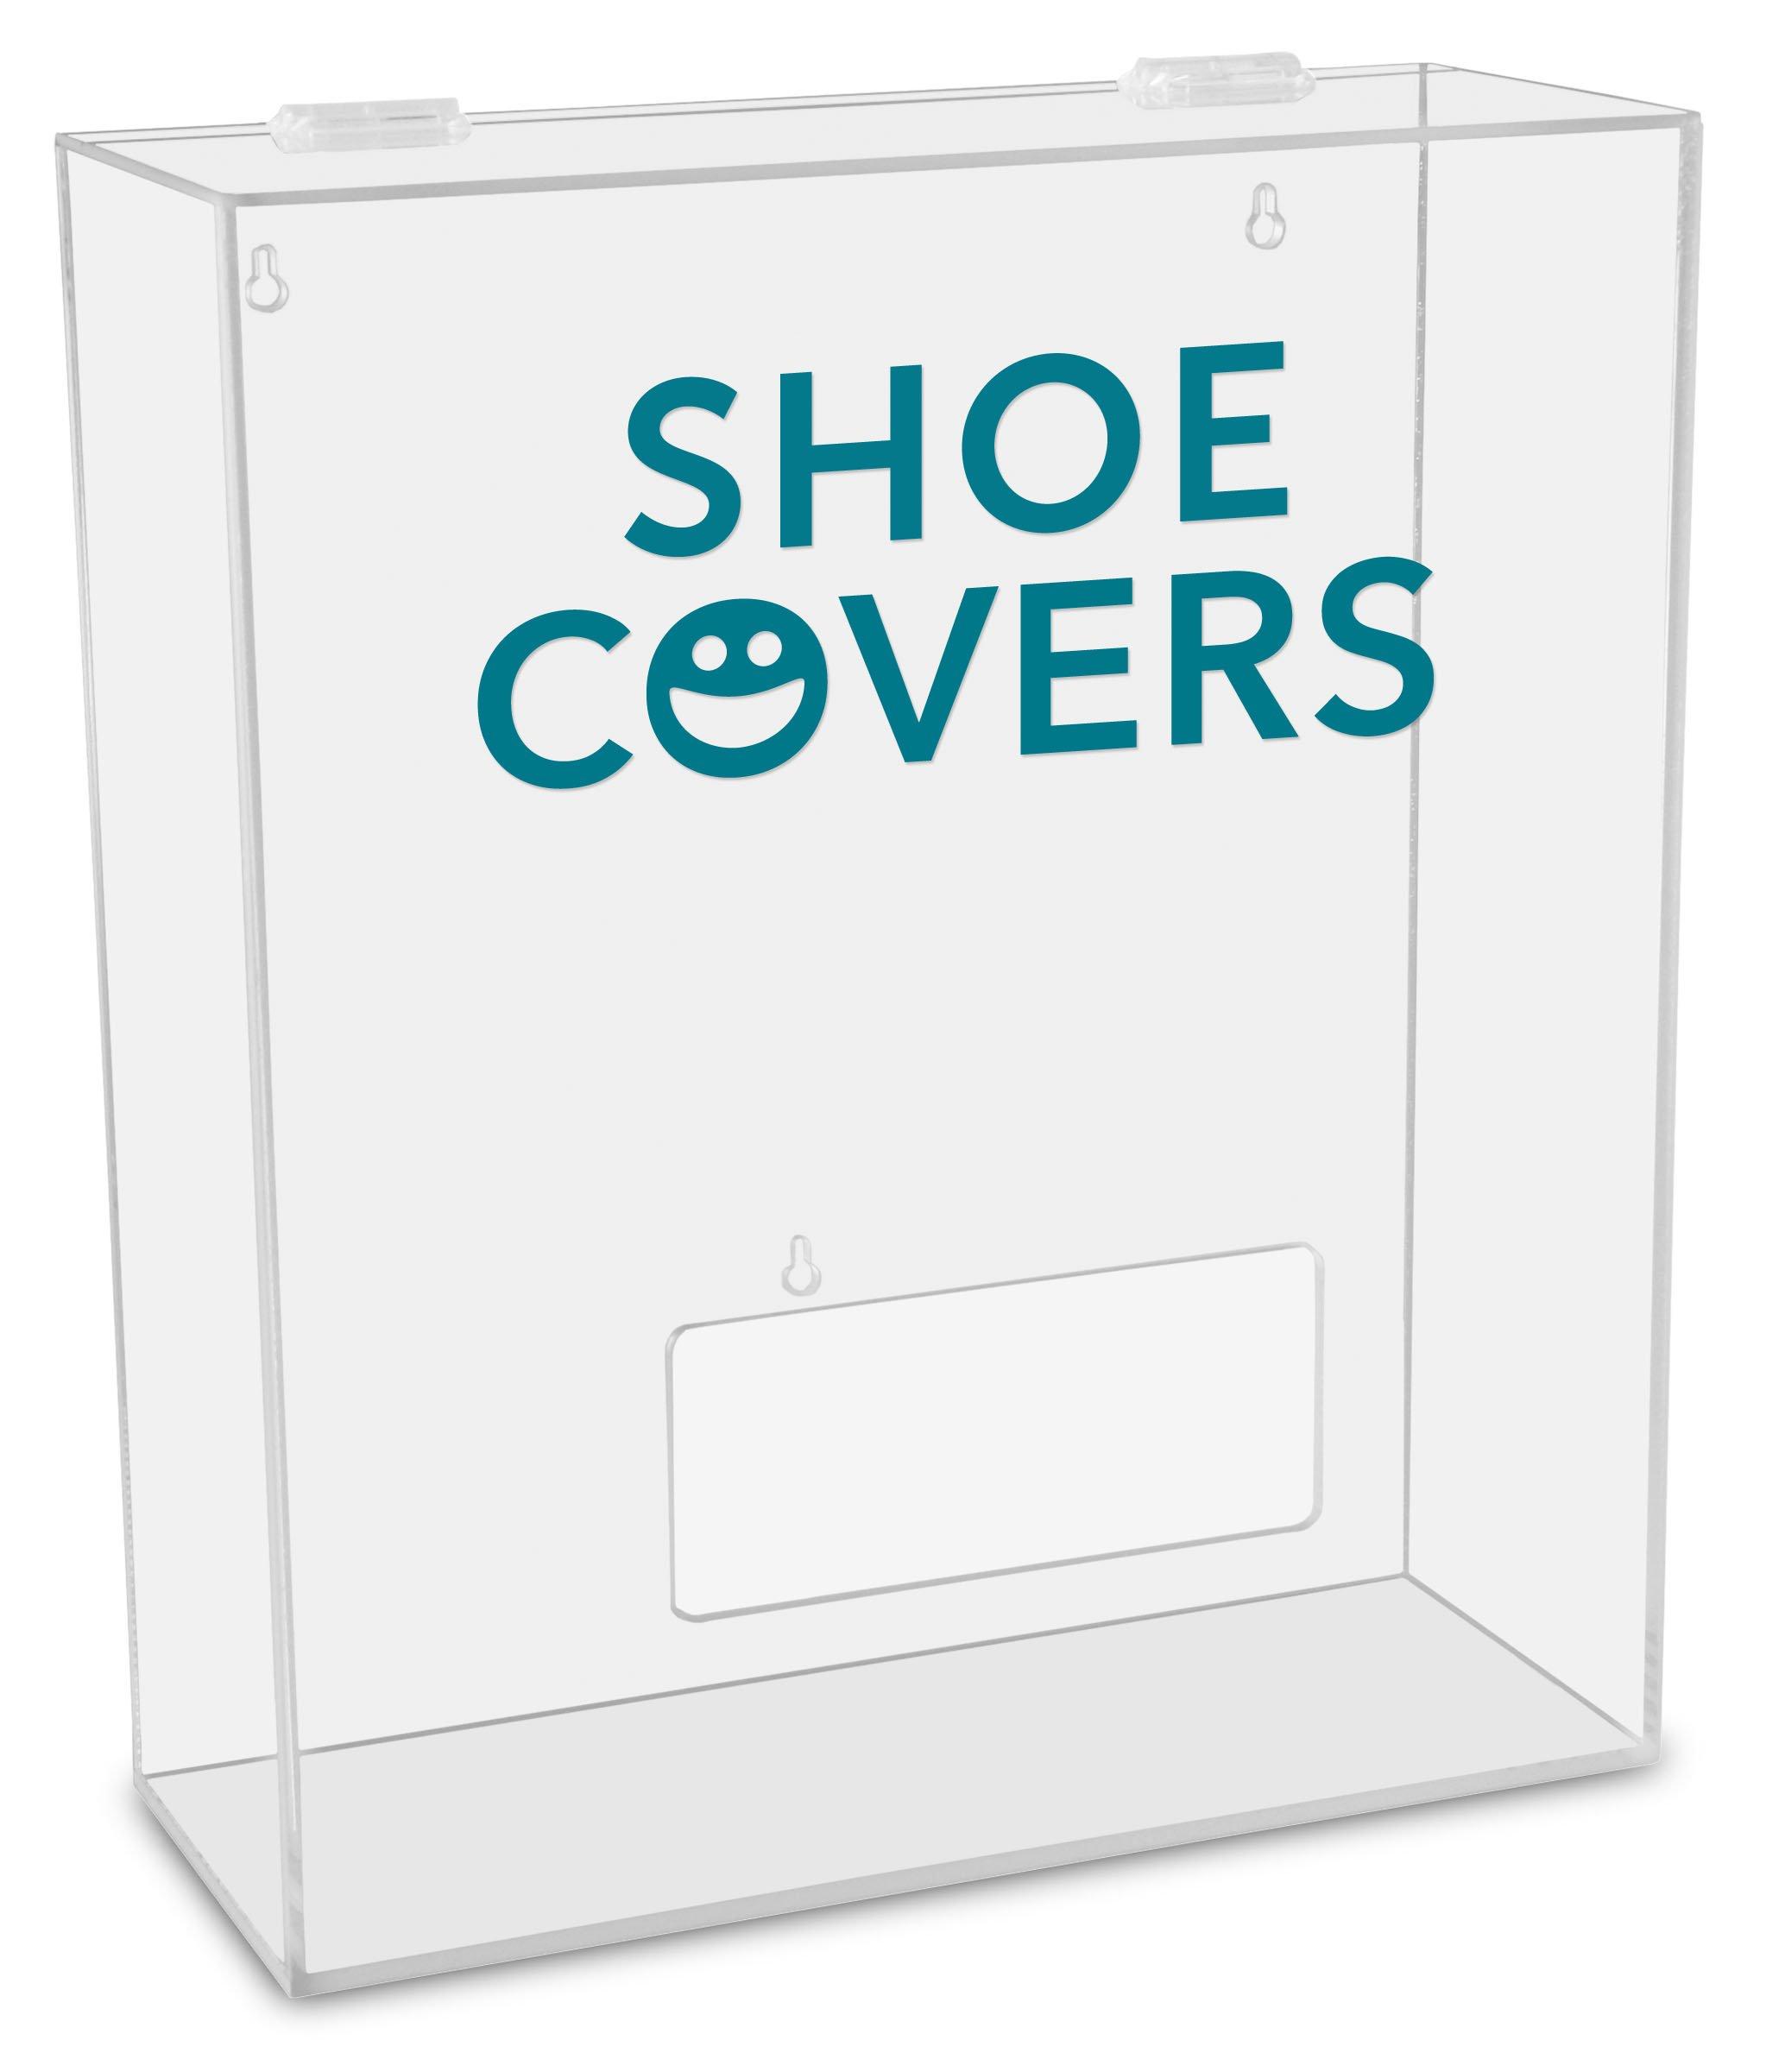 TrippNT 51317 Shoe Covers Labeled Medium Apparel Dispenser, 15'' Width x 18'' Height x 6'' Depth